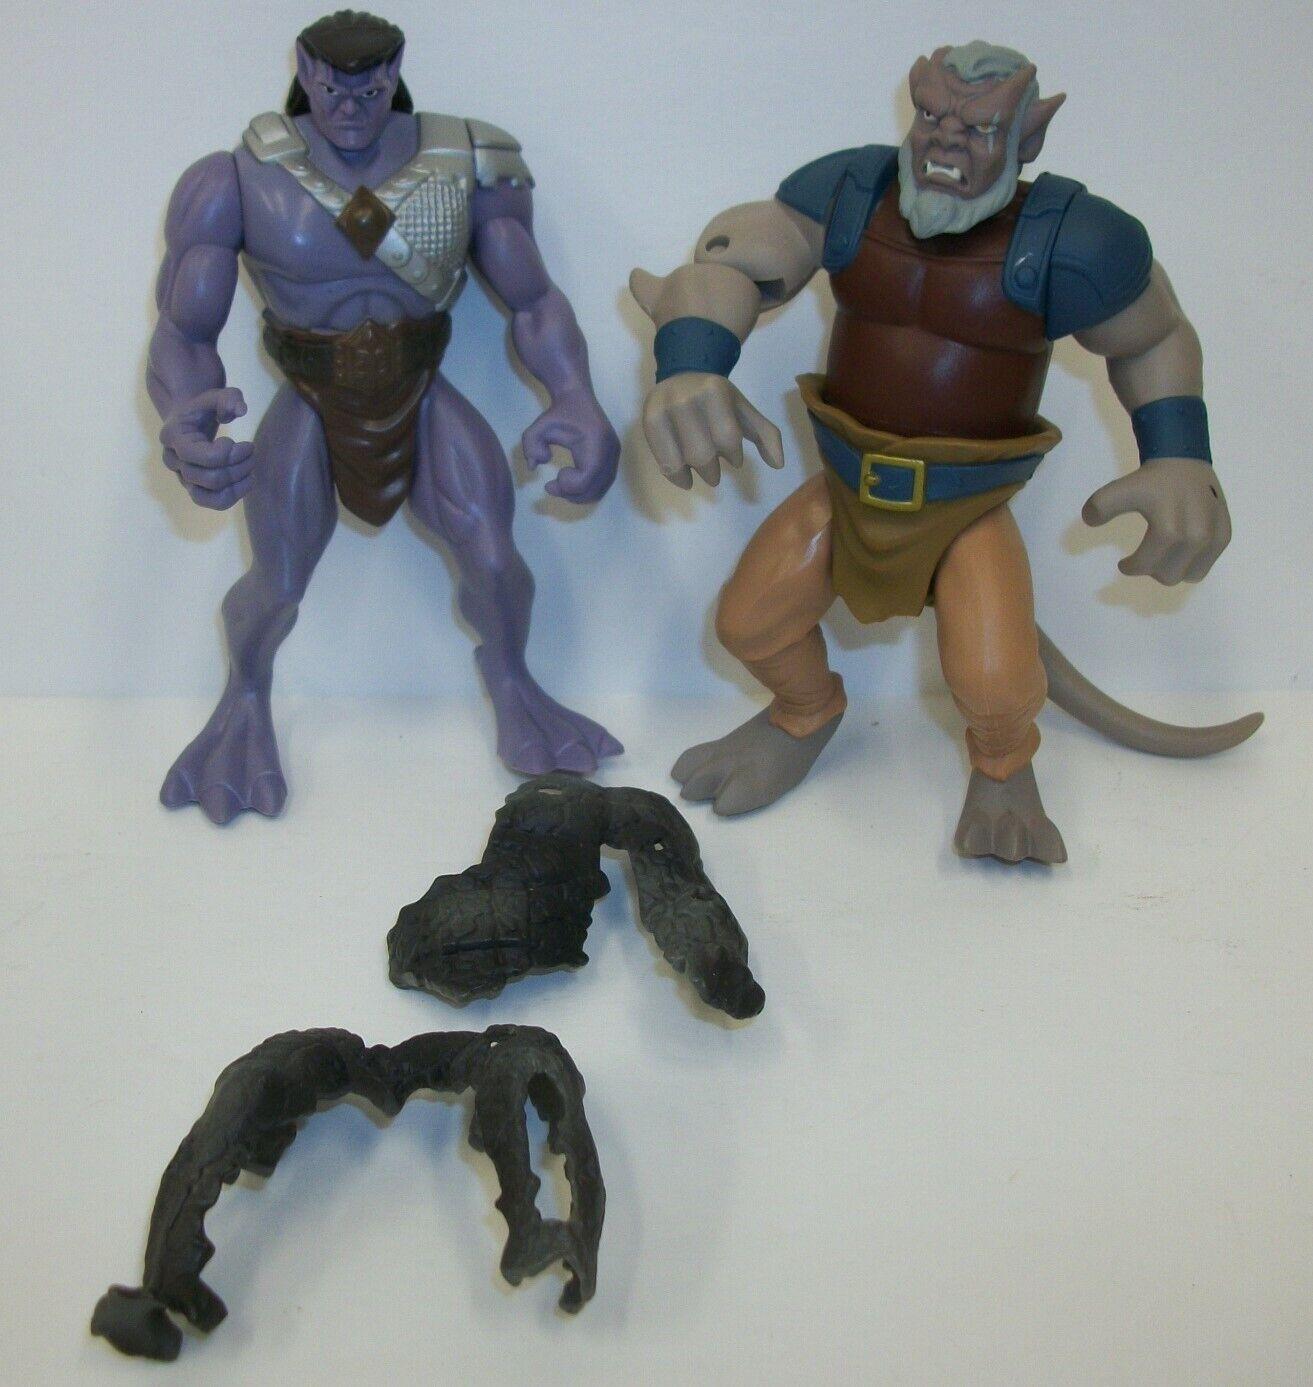 1995 BVTV Kenner Gargoyles Action Figures Toys Goliath Hudson & Armor